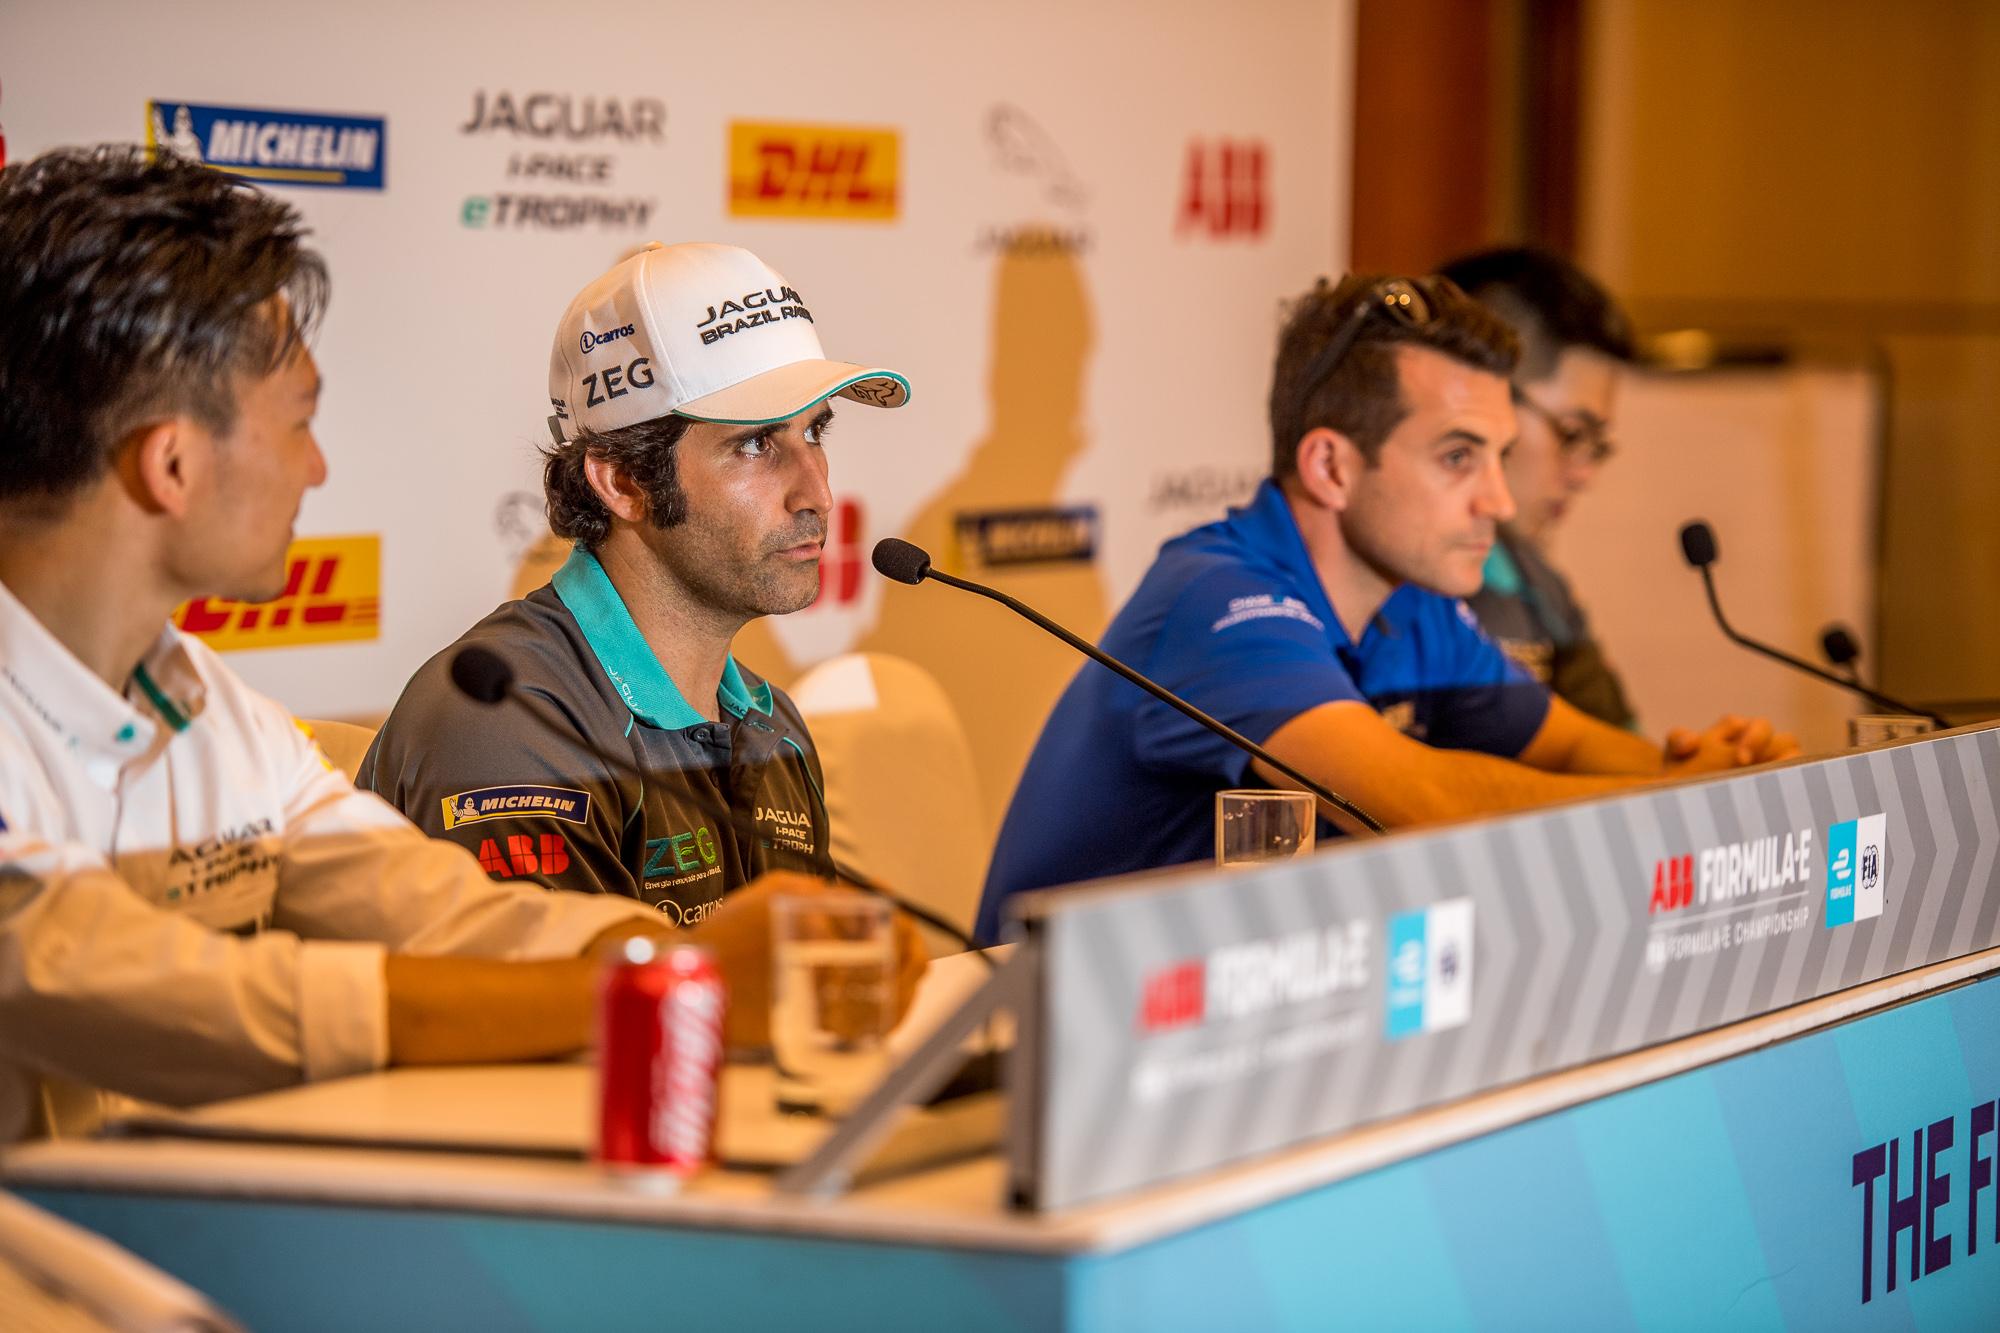 Jaguar_4.Sanya_josemariodias_02010